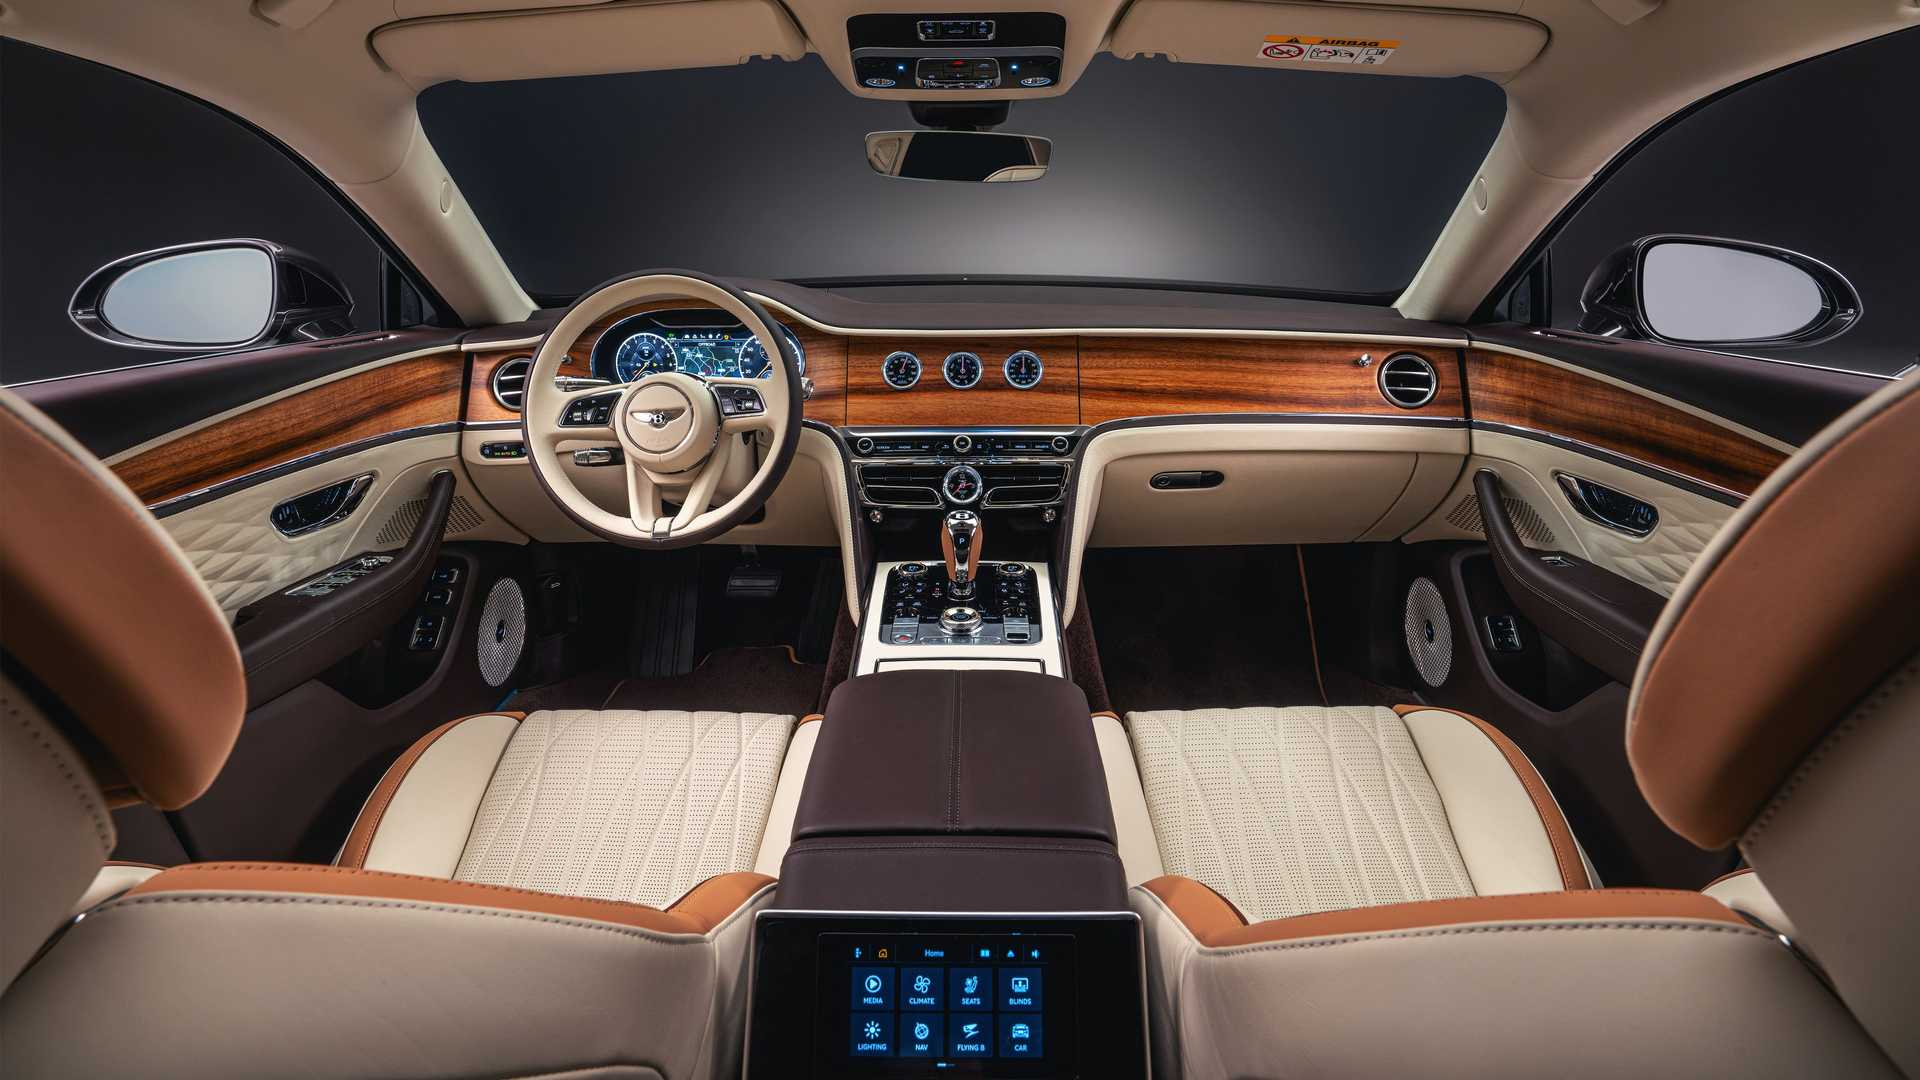 The Bentley Flying Spur PHEV Odyssean Edition interior.